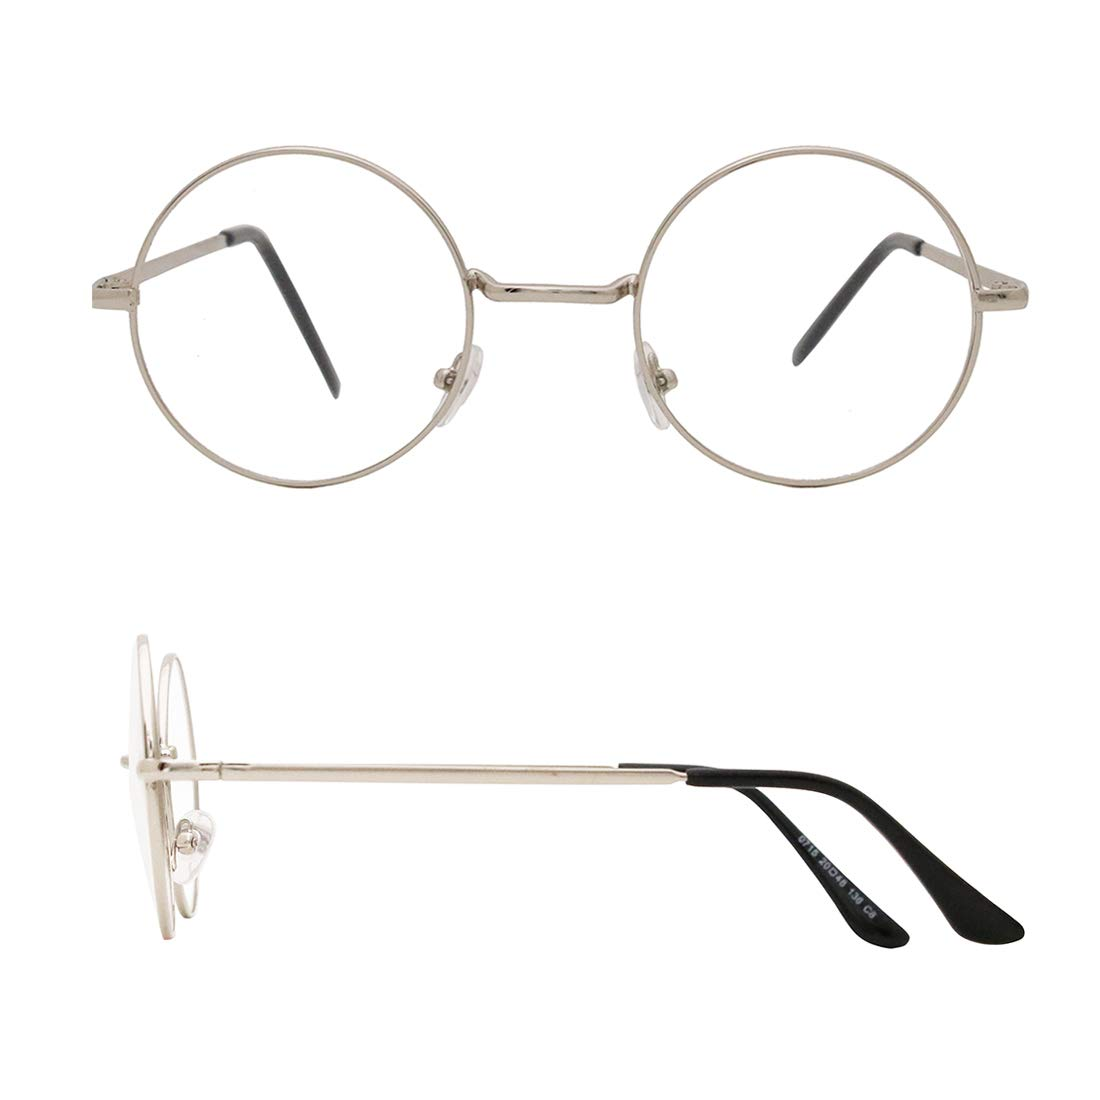 SIPU Retro Round Metal Frame Clear Lens Glasses Non-Prescription Eyewear Women Men